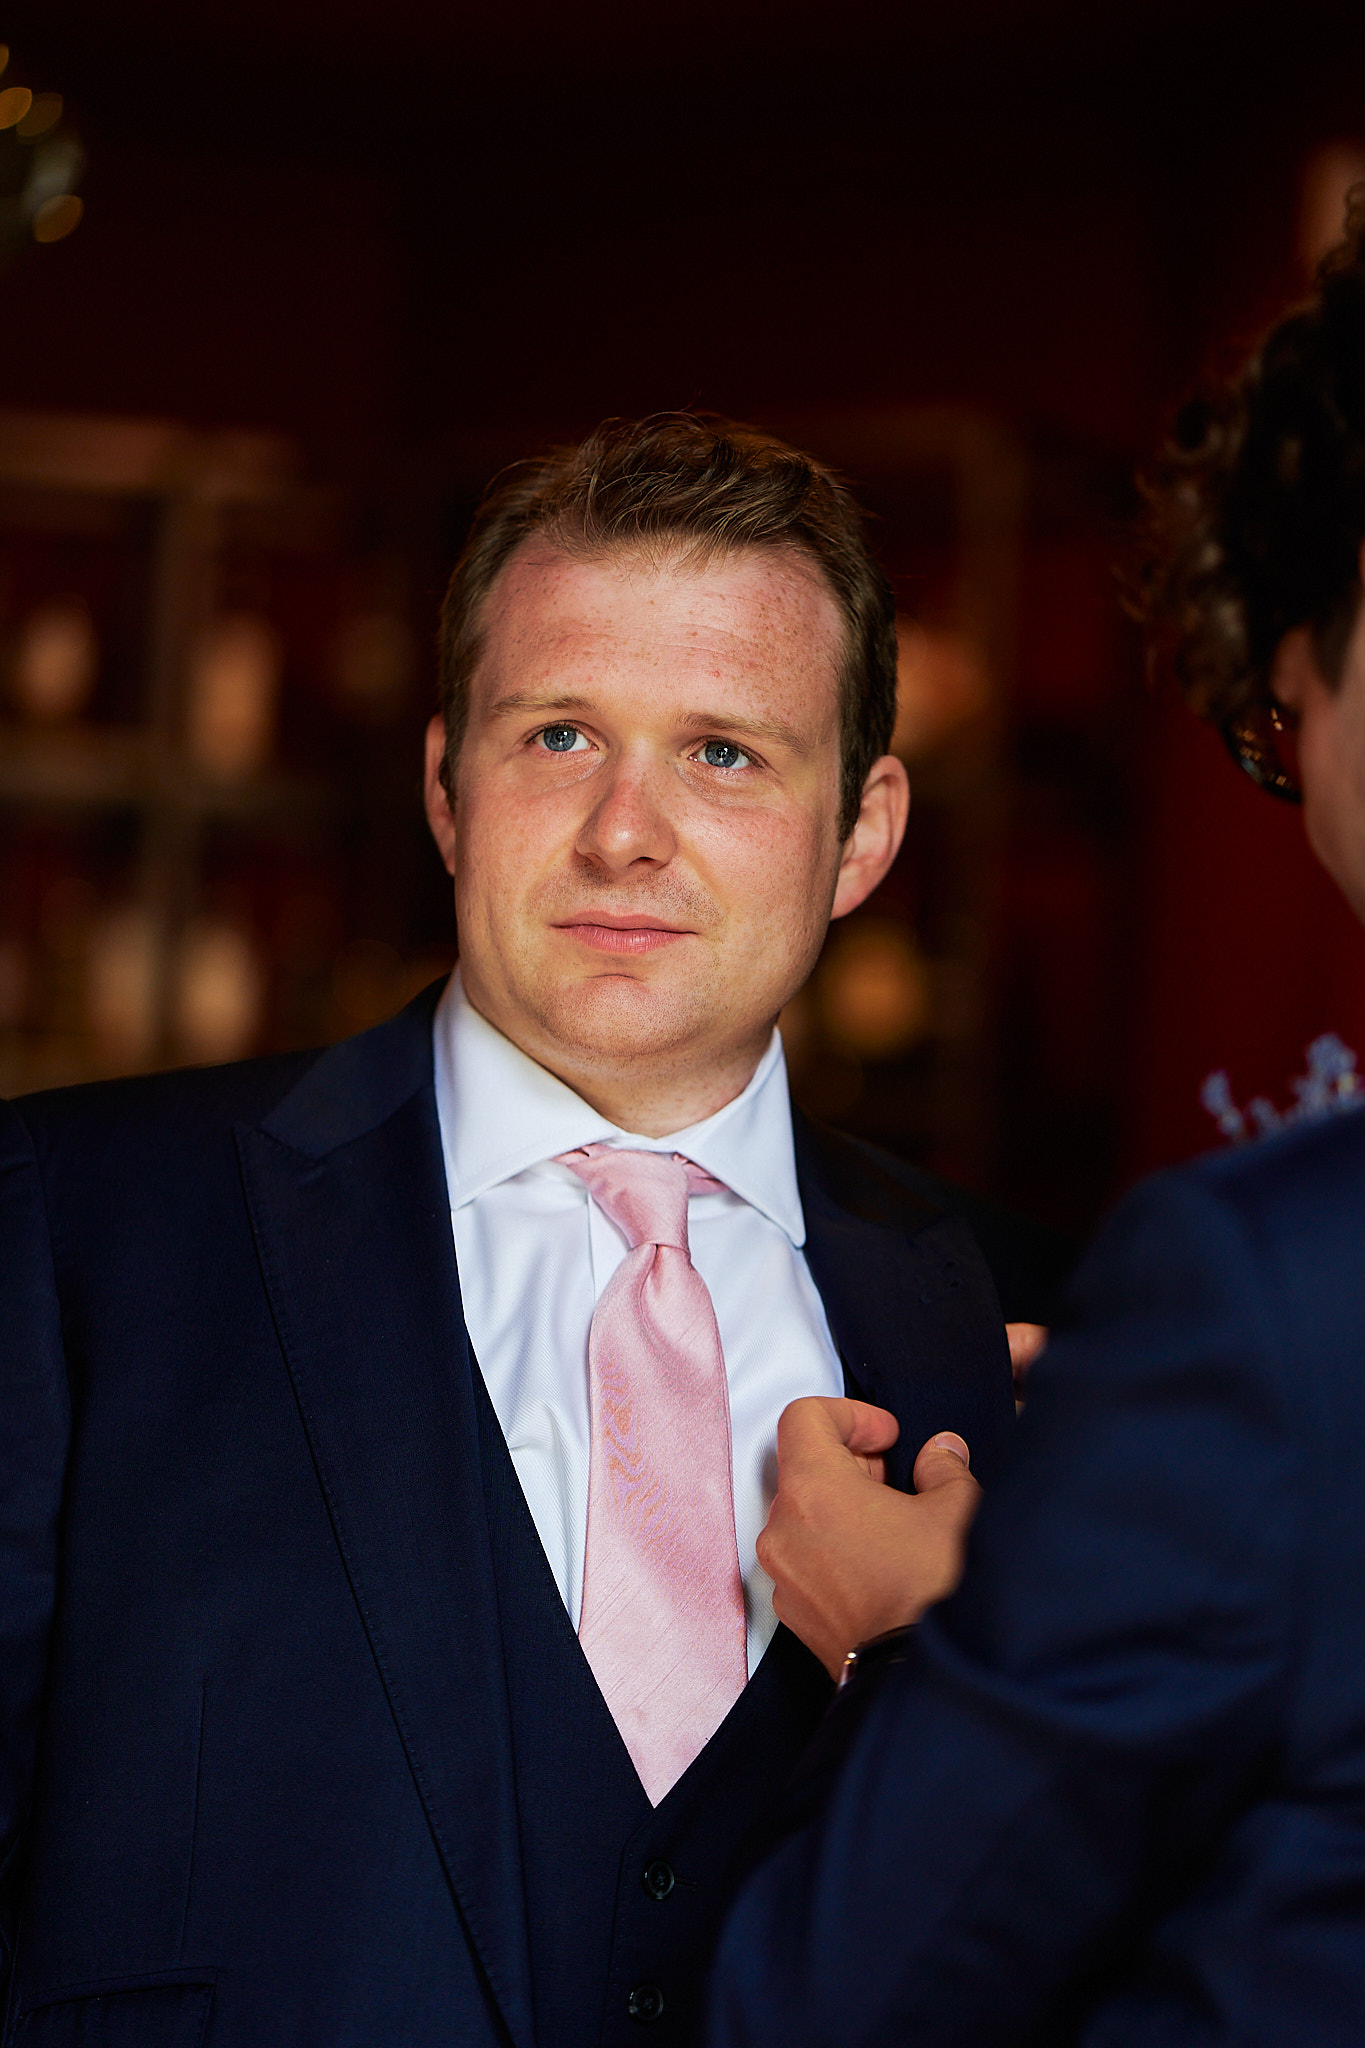 portrait of groom in bar